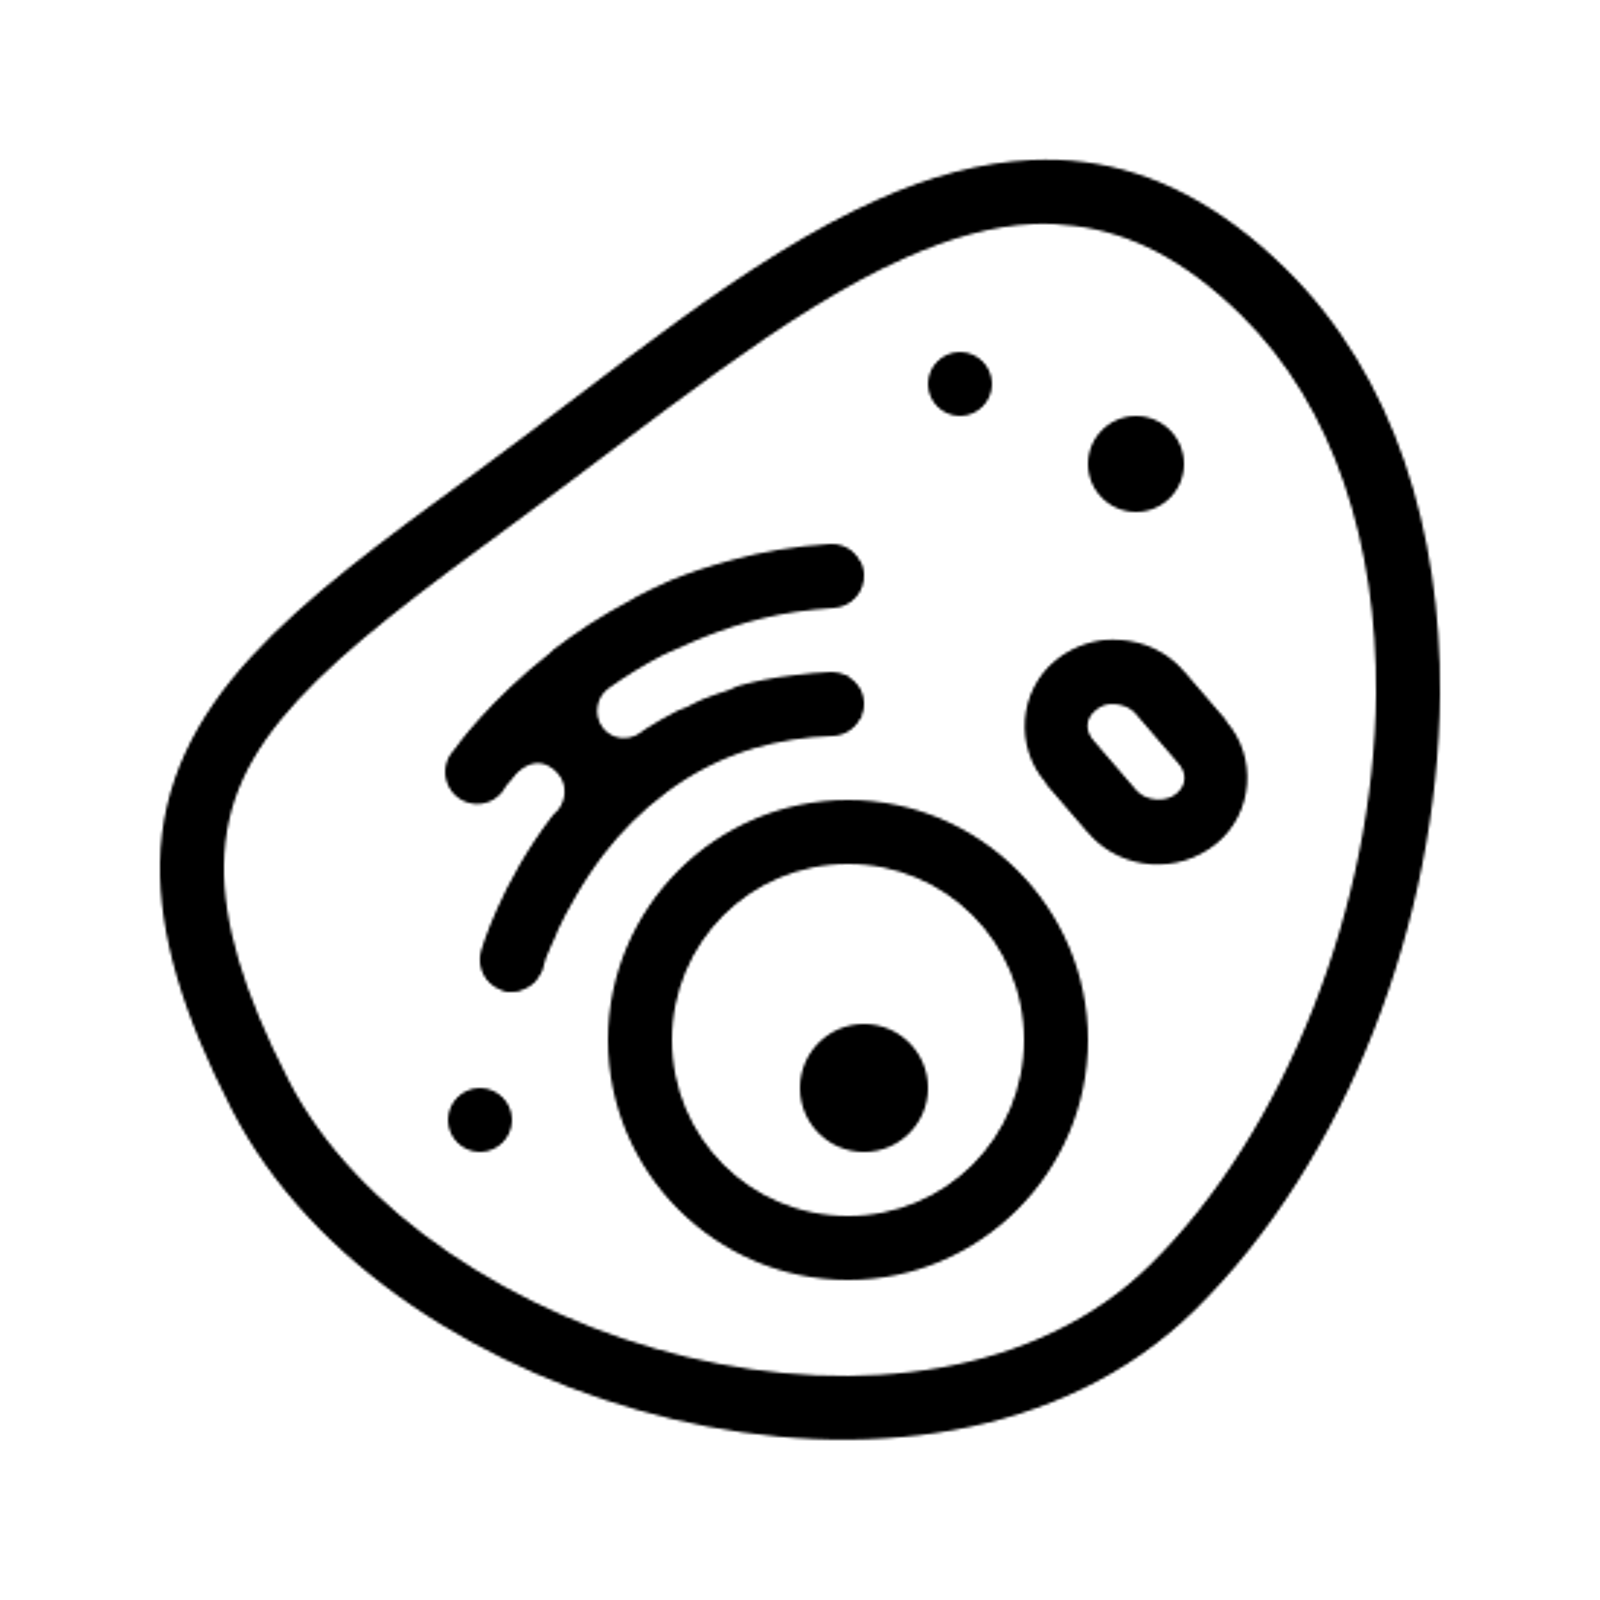 Eukaryotic Cells icon